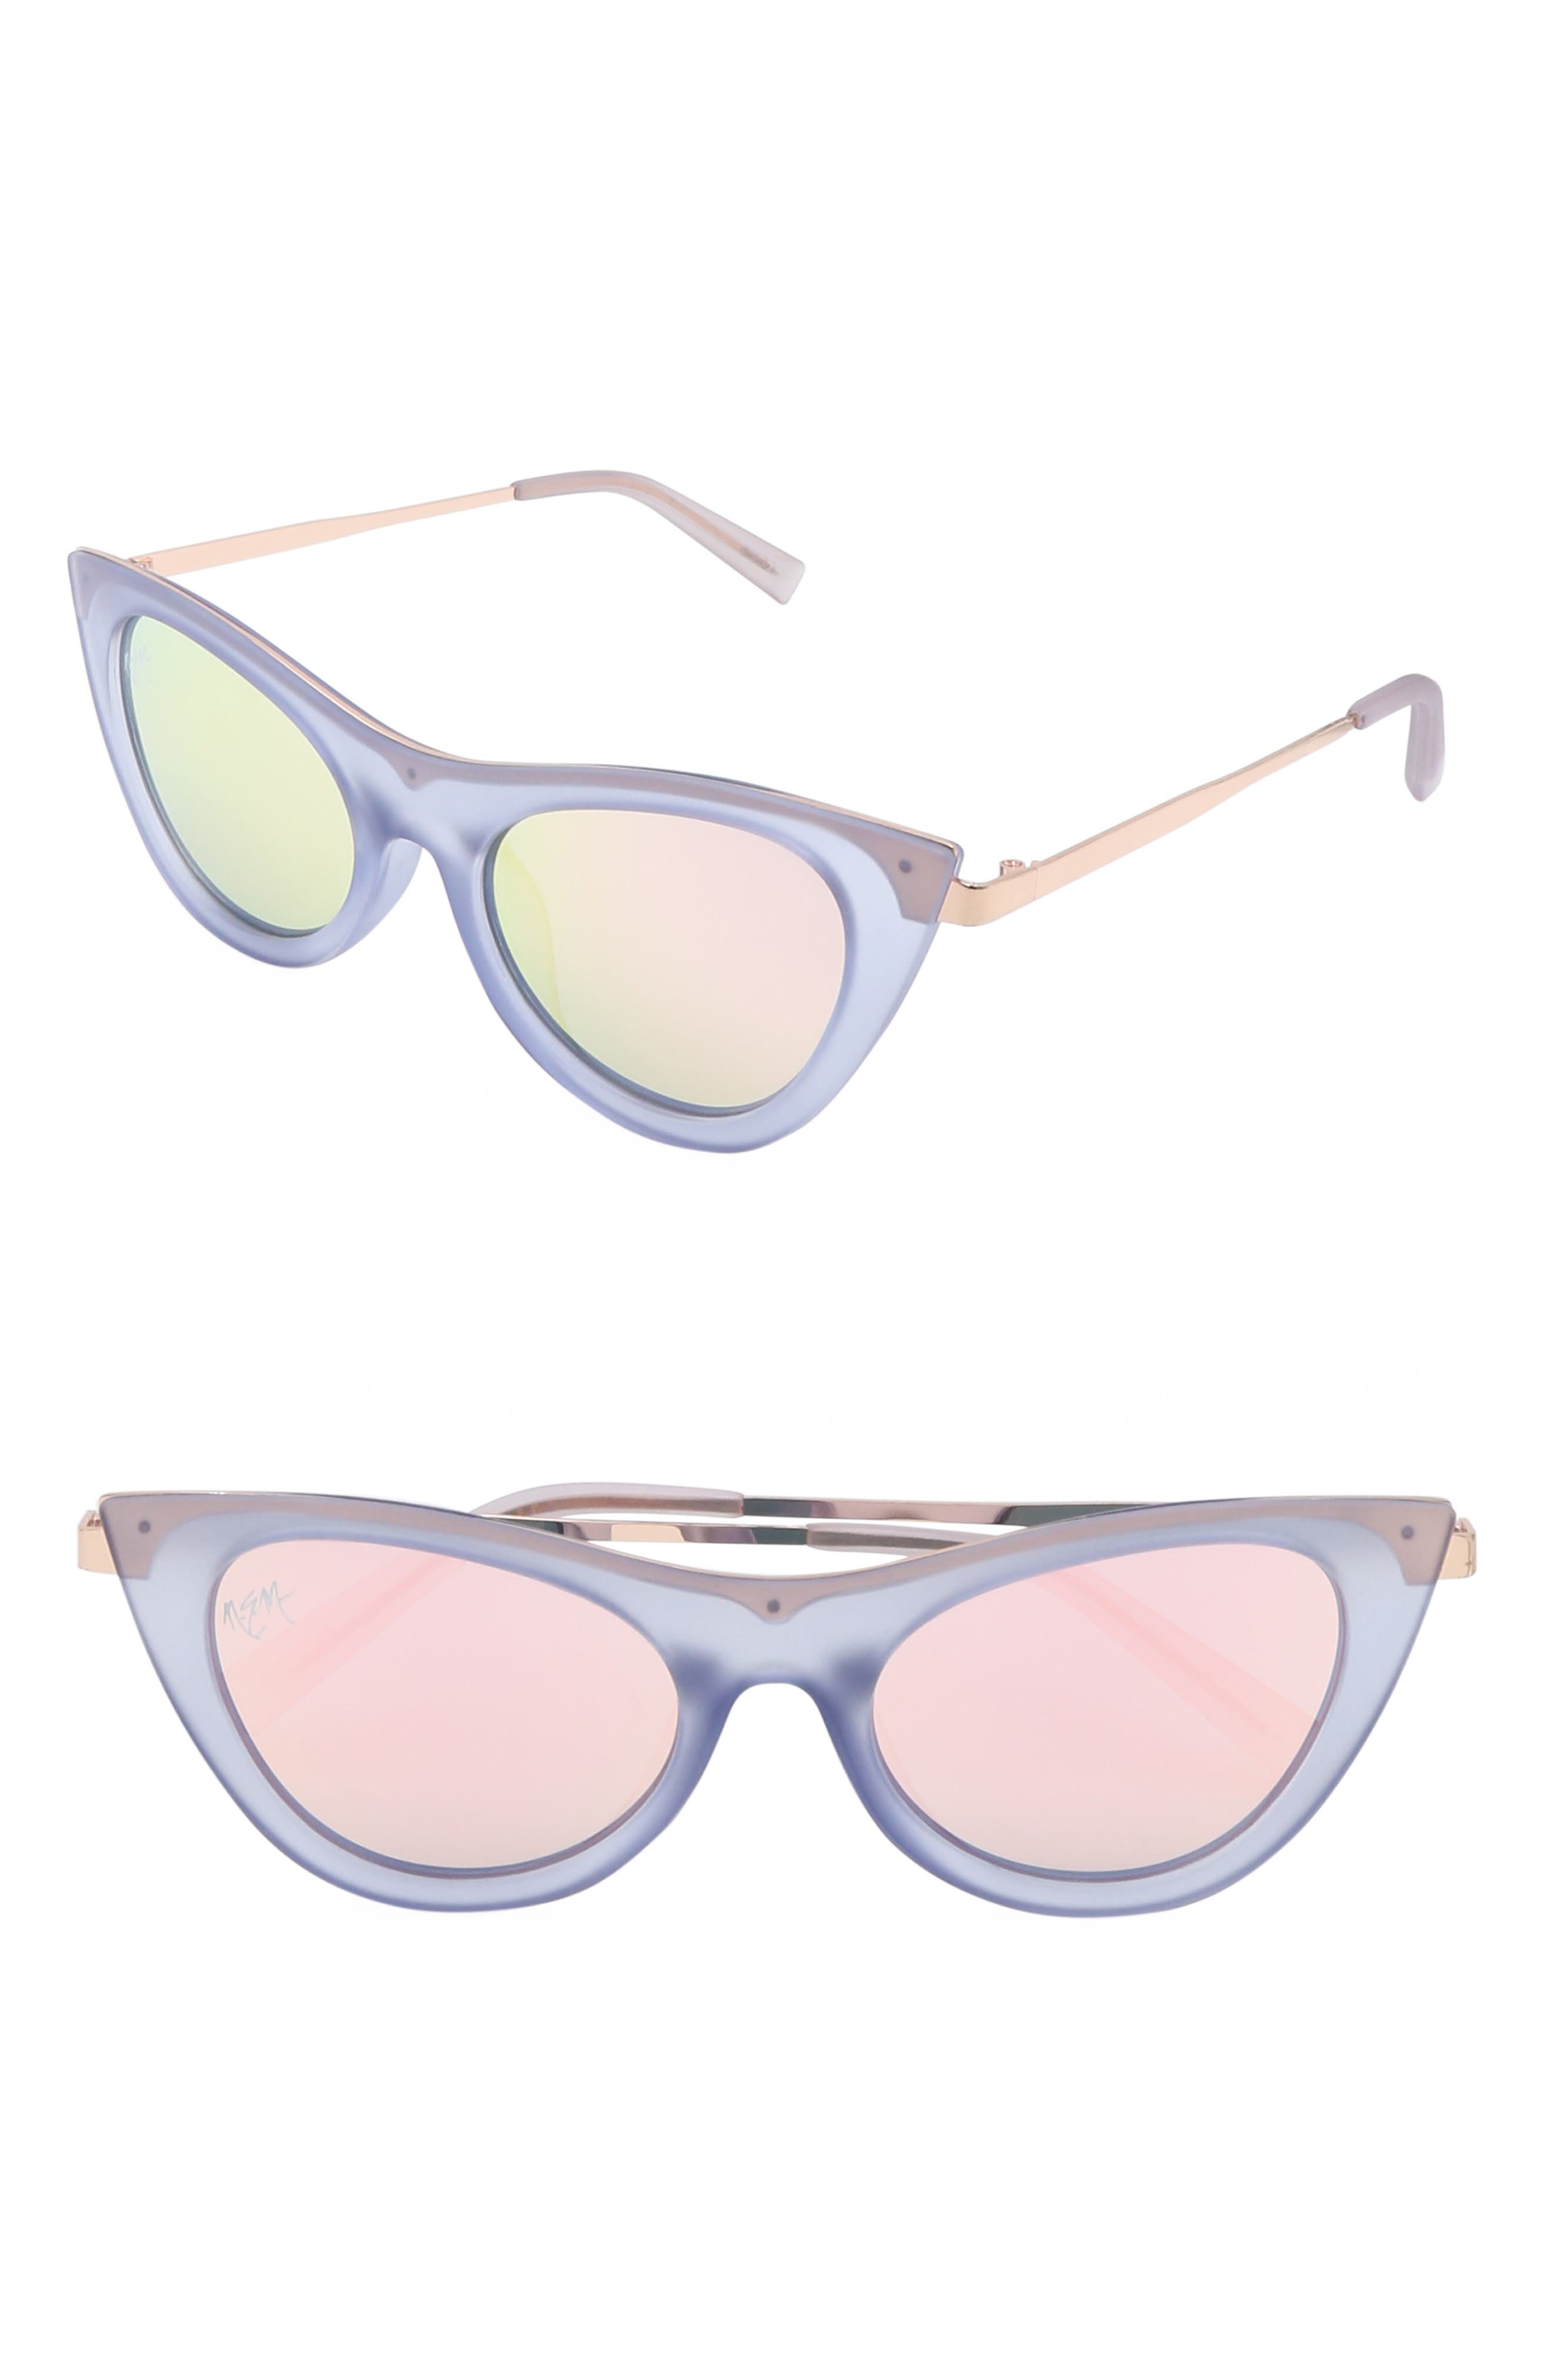 Nem Cruise 50Mm Cat Eye Sunglasses - Clear Sky Blue W Pink Tint